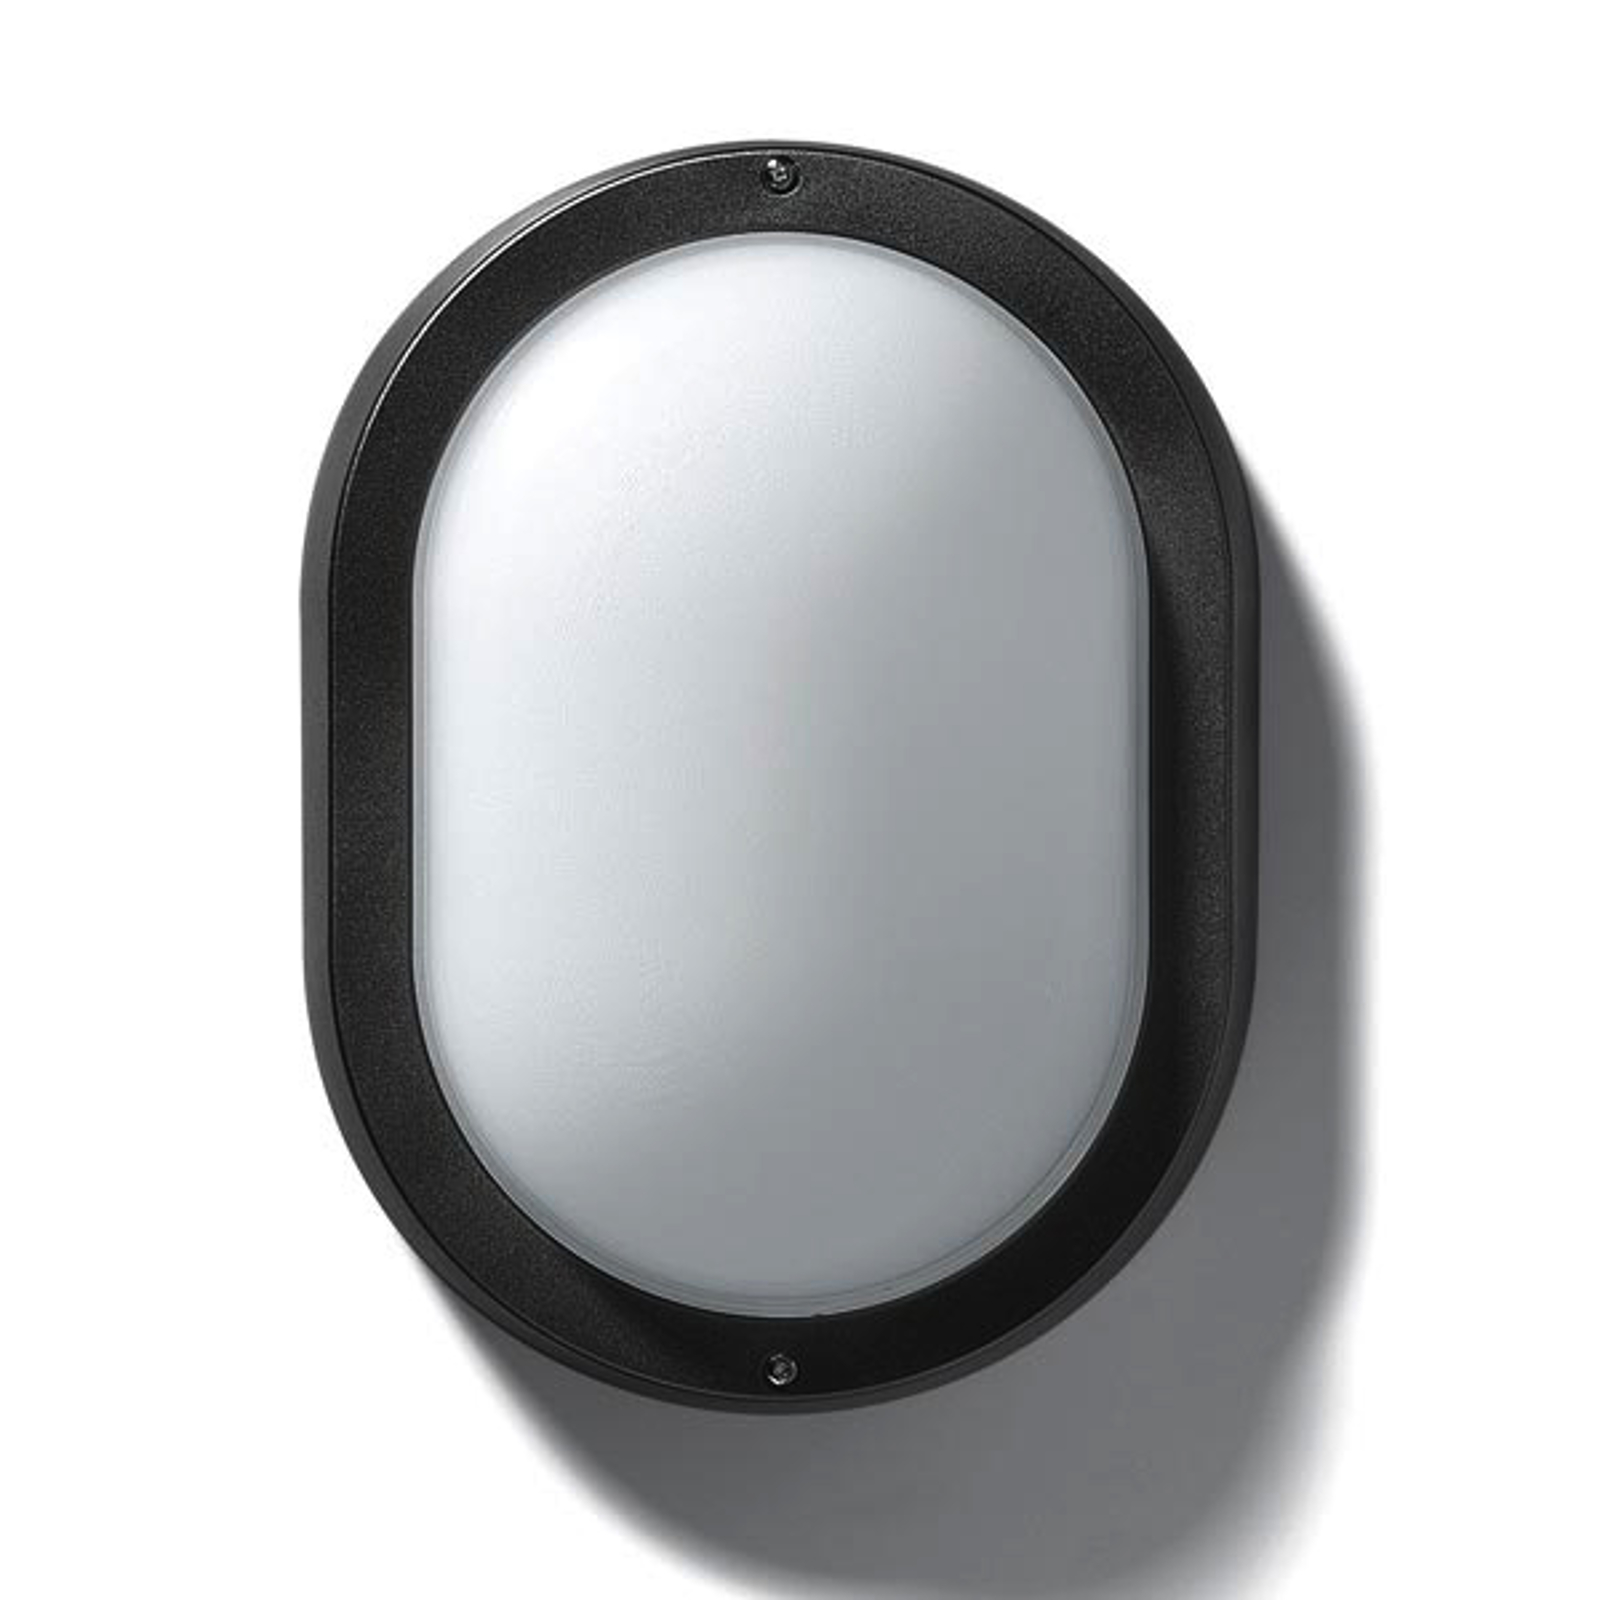 Buiten-wand- of plafondlamp EKO 19, zwart